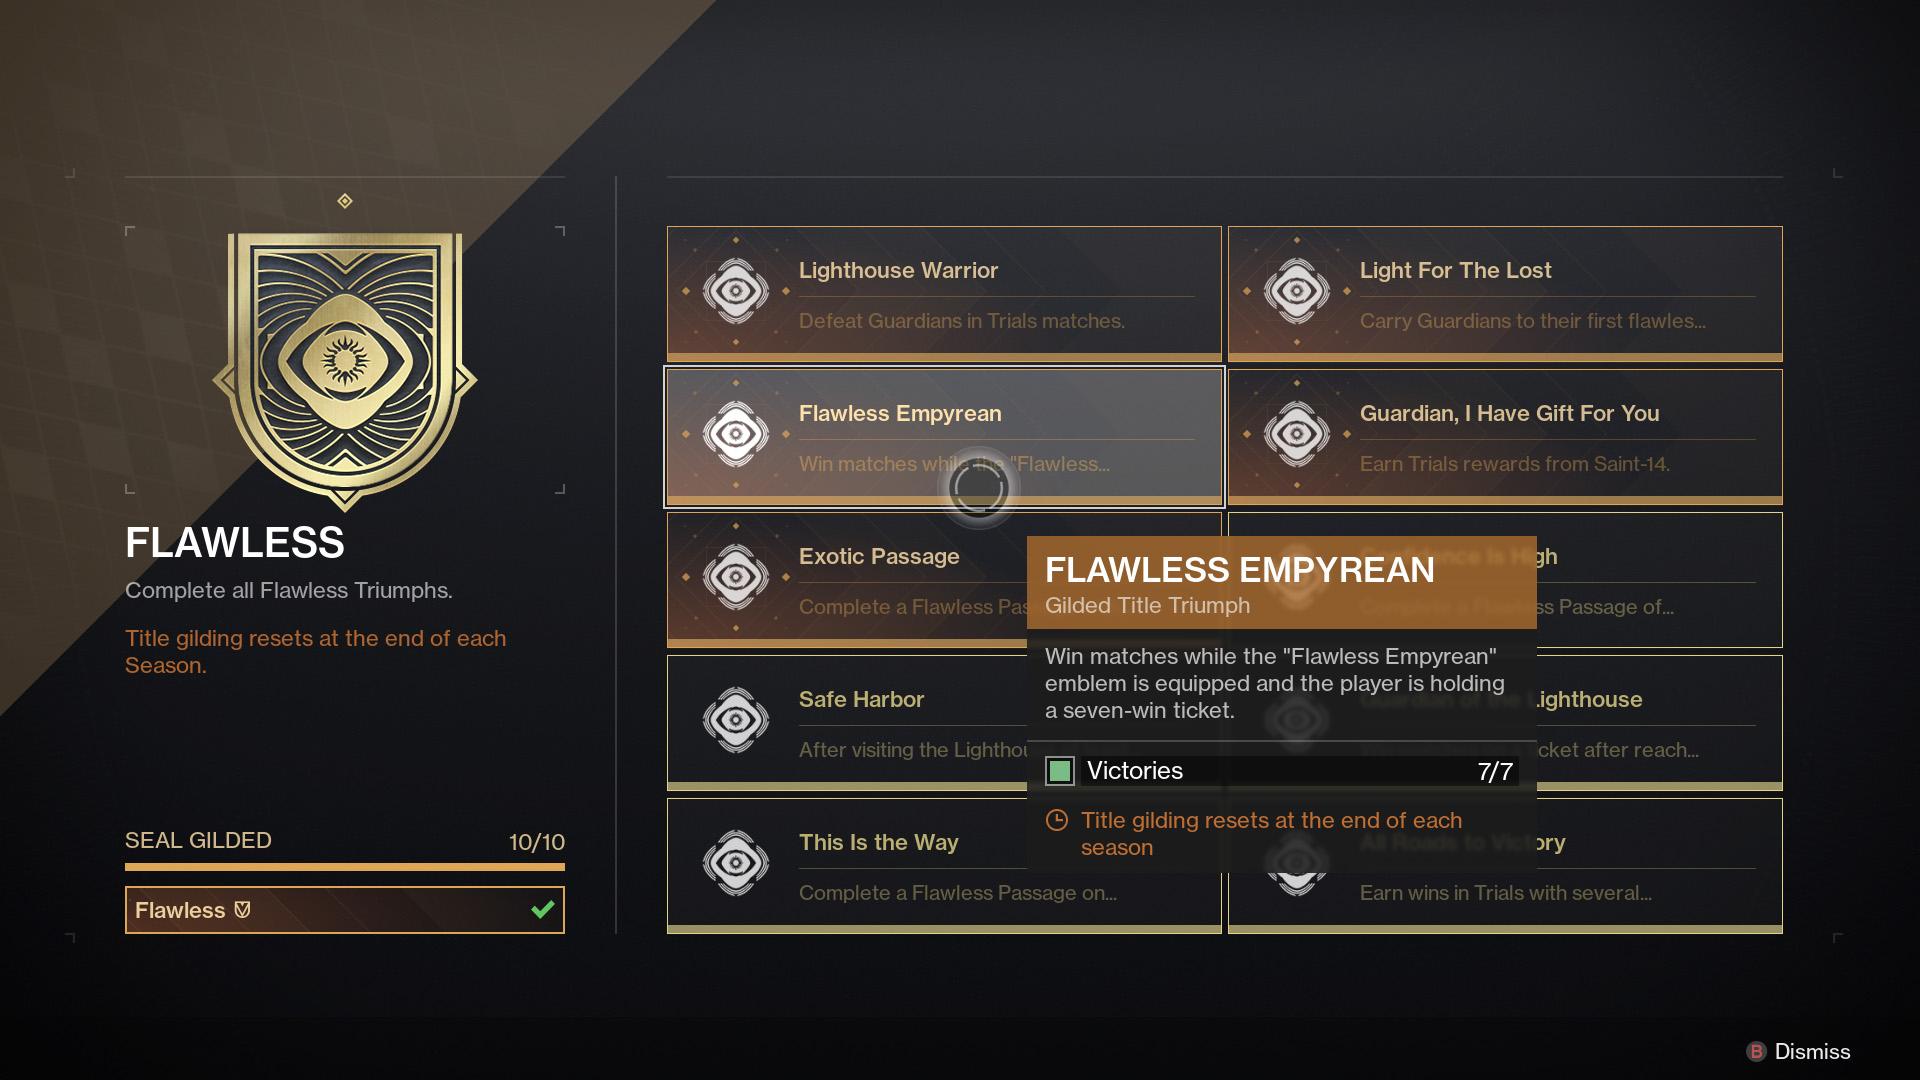 twab gilded titles destiny 2